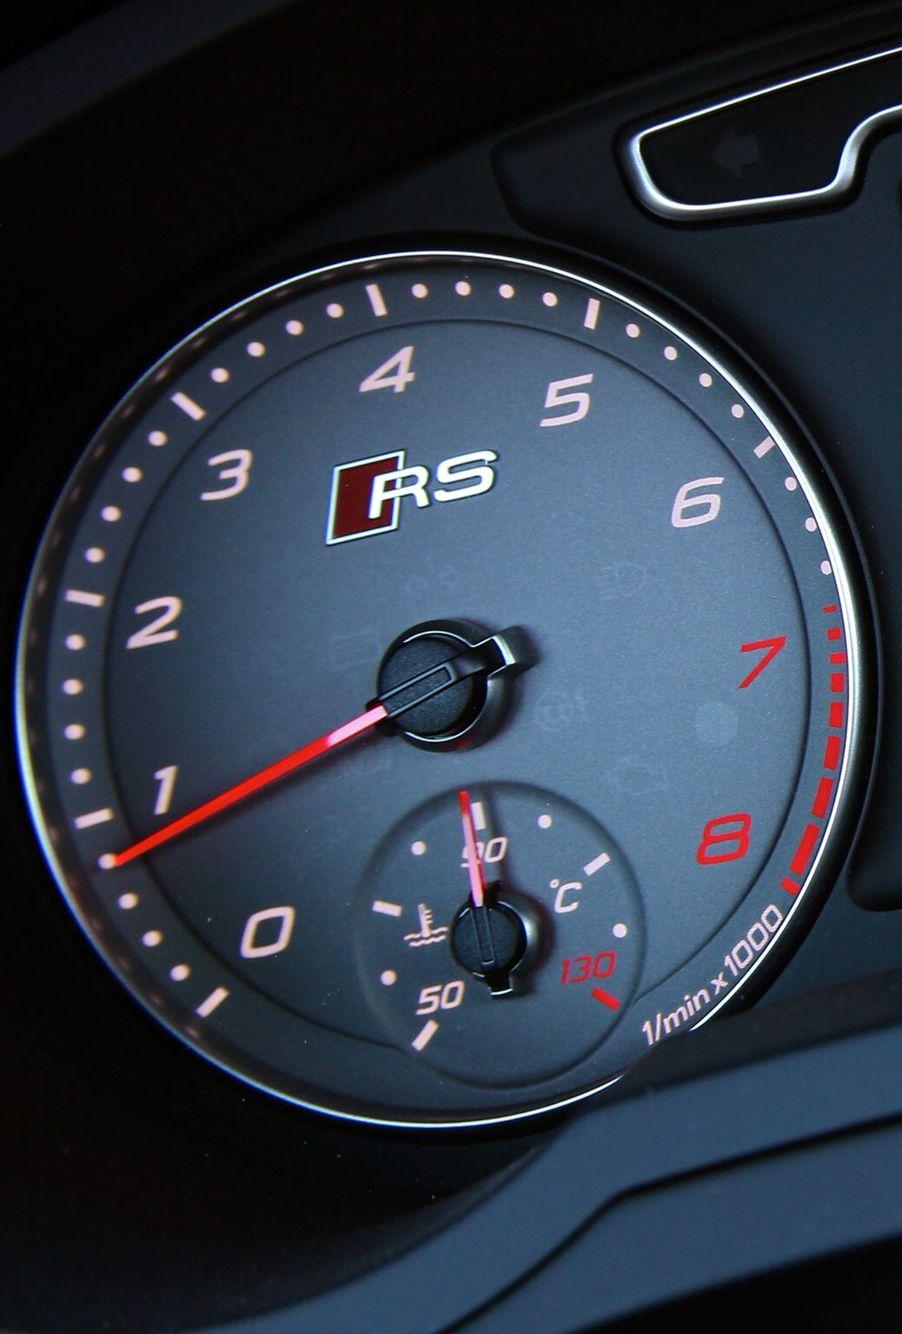 Audi RS6 Audi rs6, Audi, Audi a6 rs